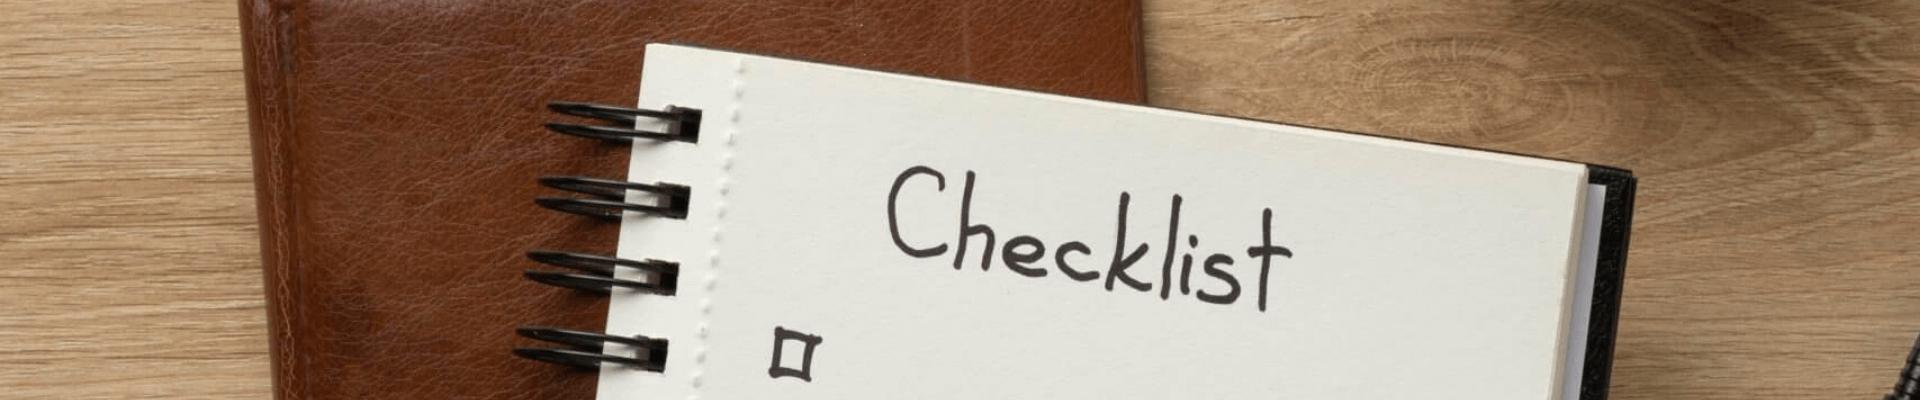 picture of checklist. Fulfilment services, 3rd party logistics, ecommerce fulfilment, e commerce warehouse, ecommerce fulfillment services, 3pl services, 3pl fulfilment